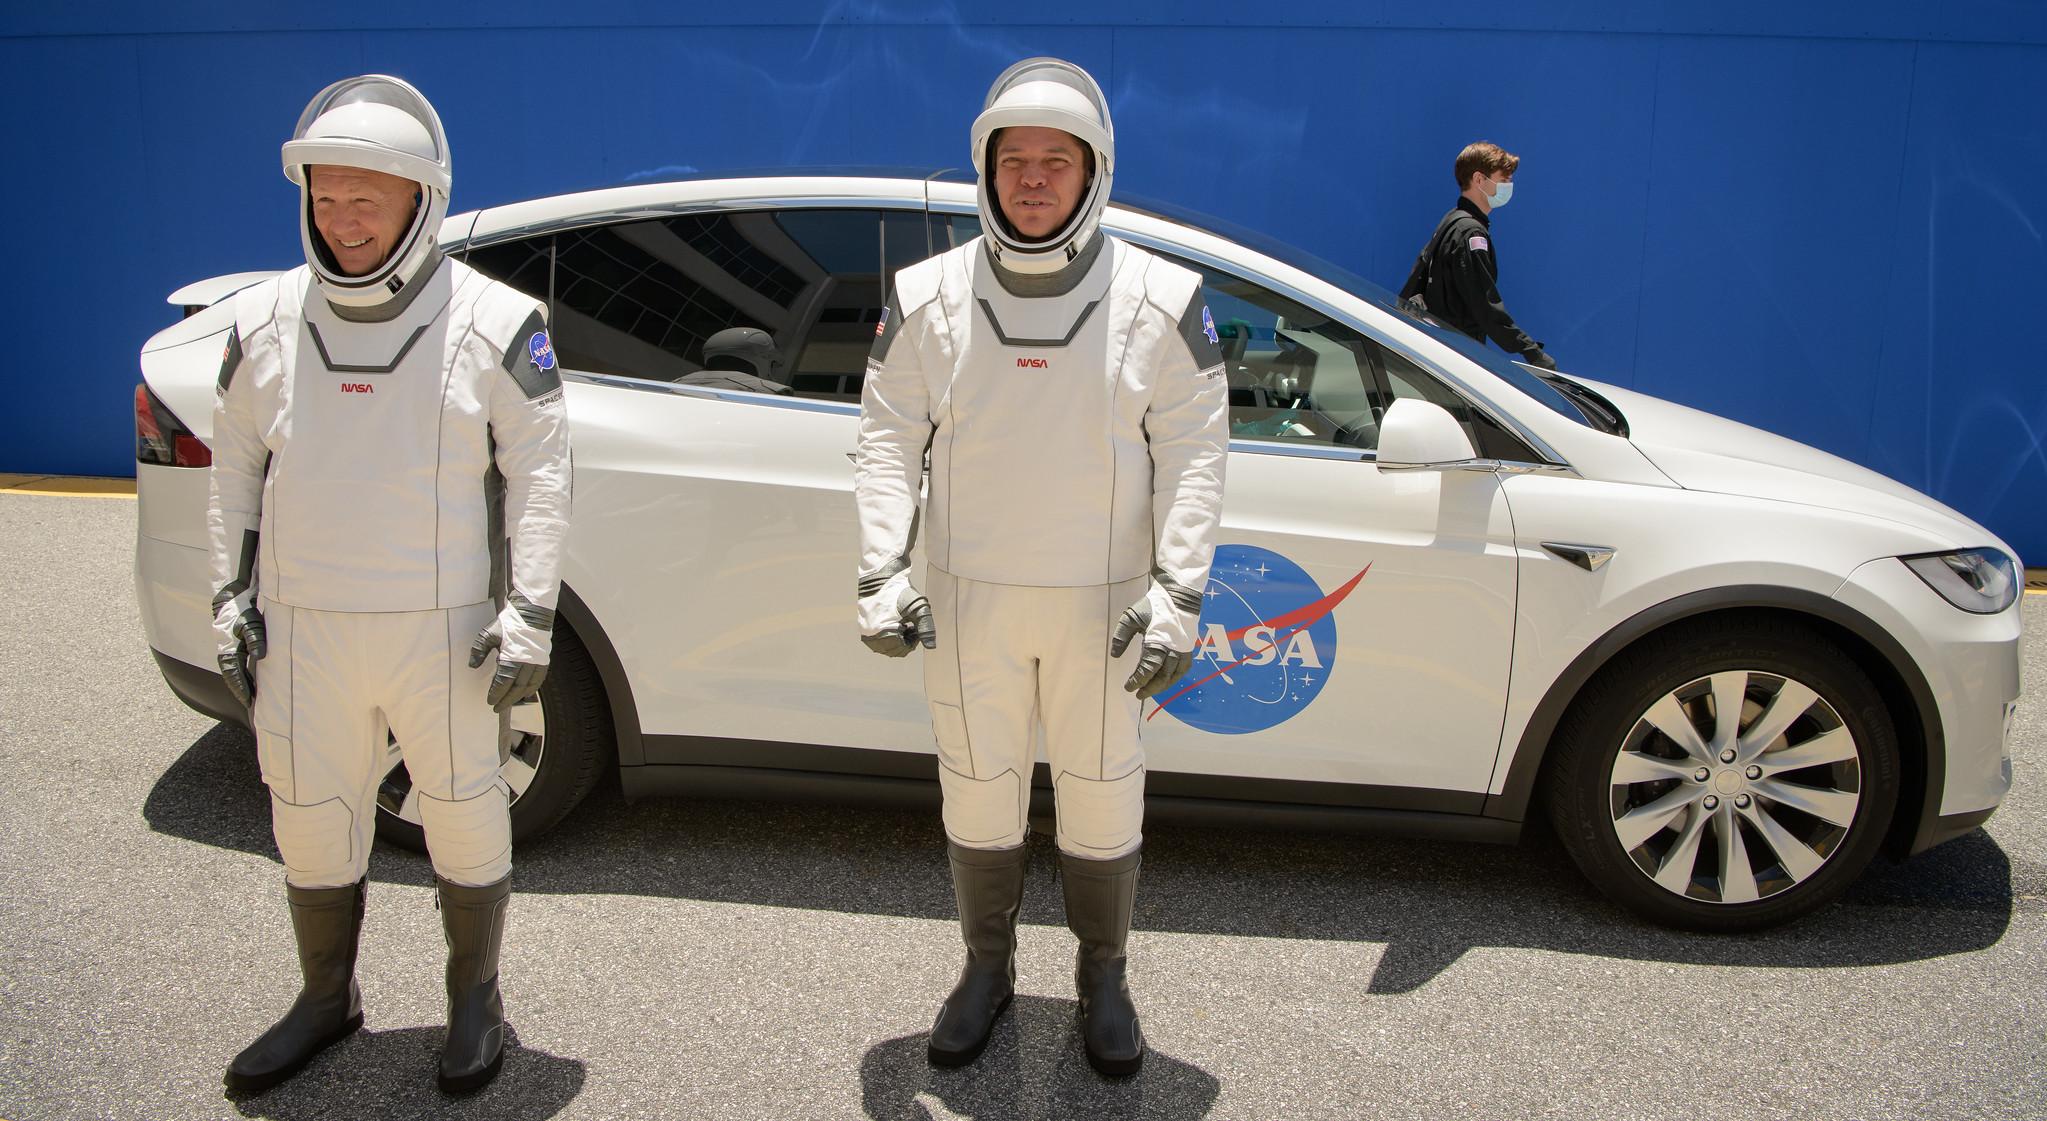 Coverage of Landmark NASA SpaceX Commercial Crew Test Flight | NASA